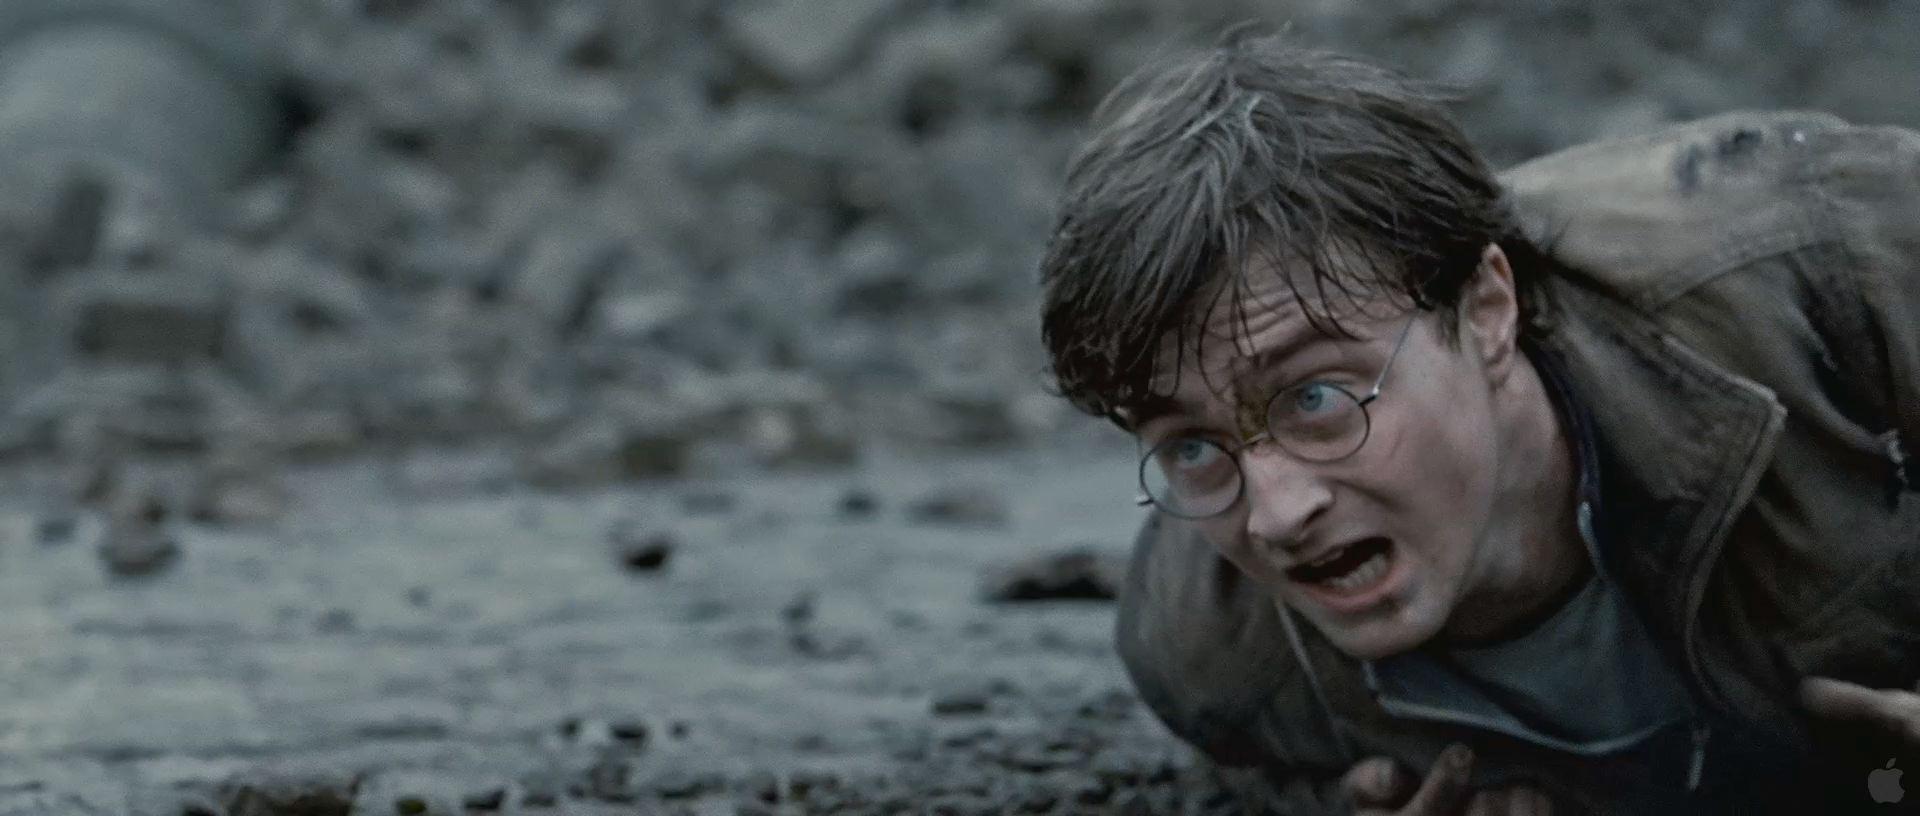 Harry Potter BlogHogwarts HP7 2 Trailer 49